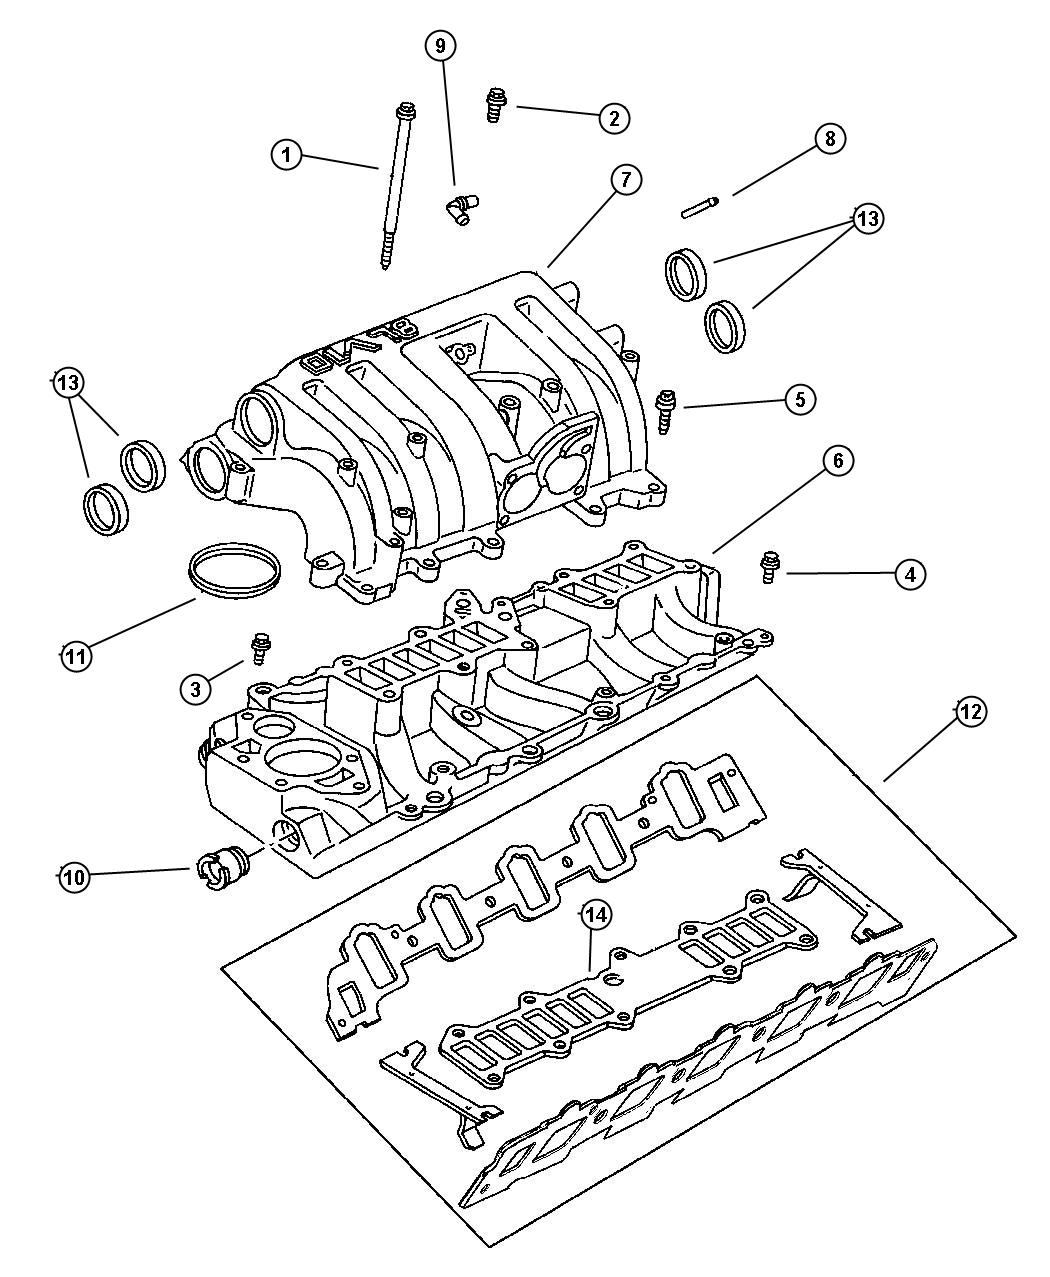 Dodge Ram Seal Thermostat Thermostat 8 0l Engine